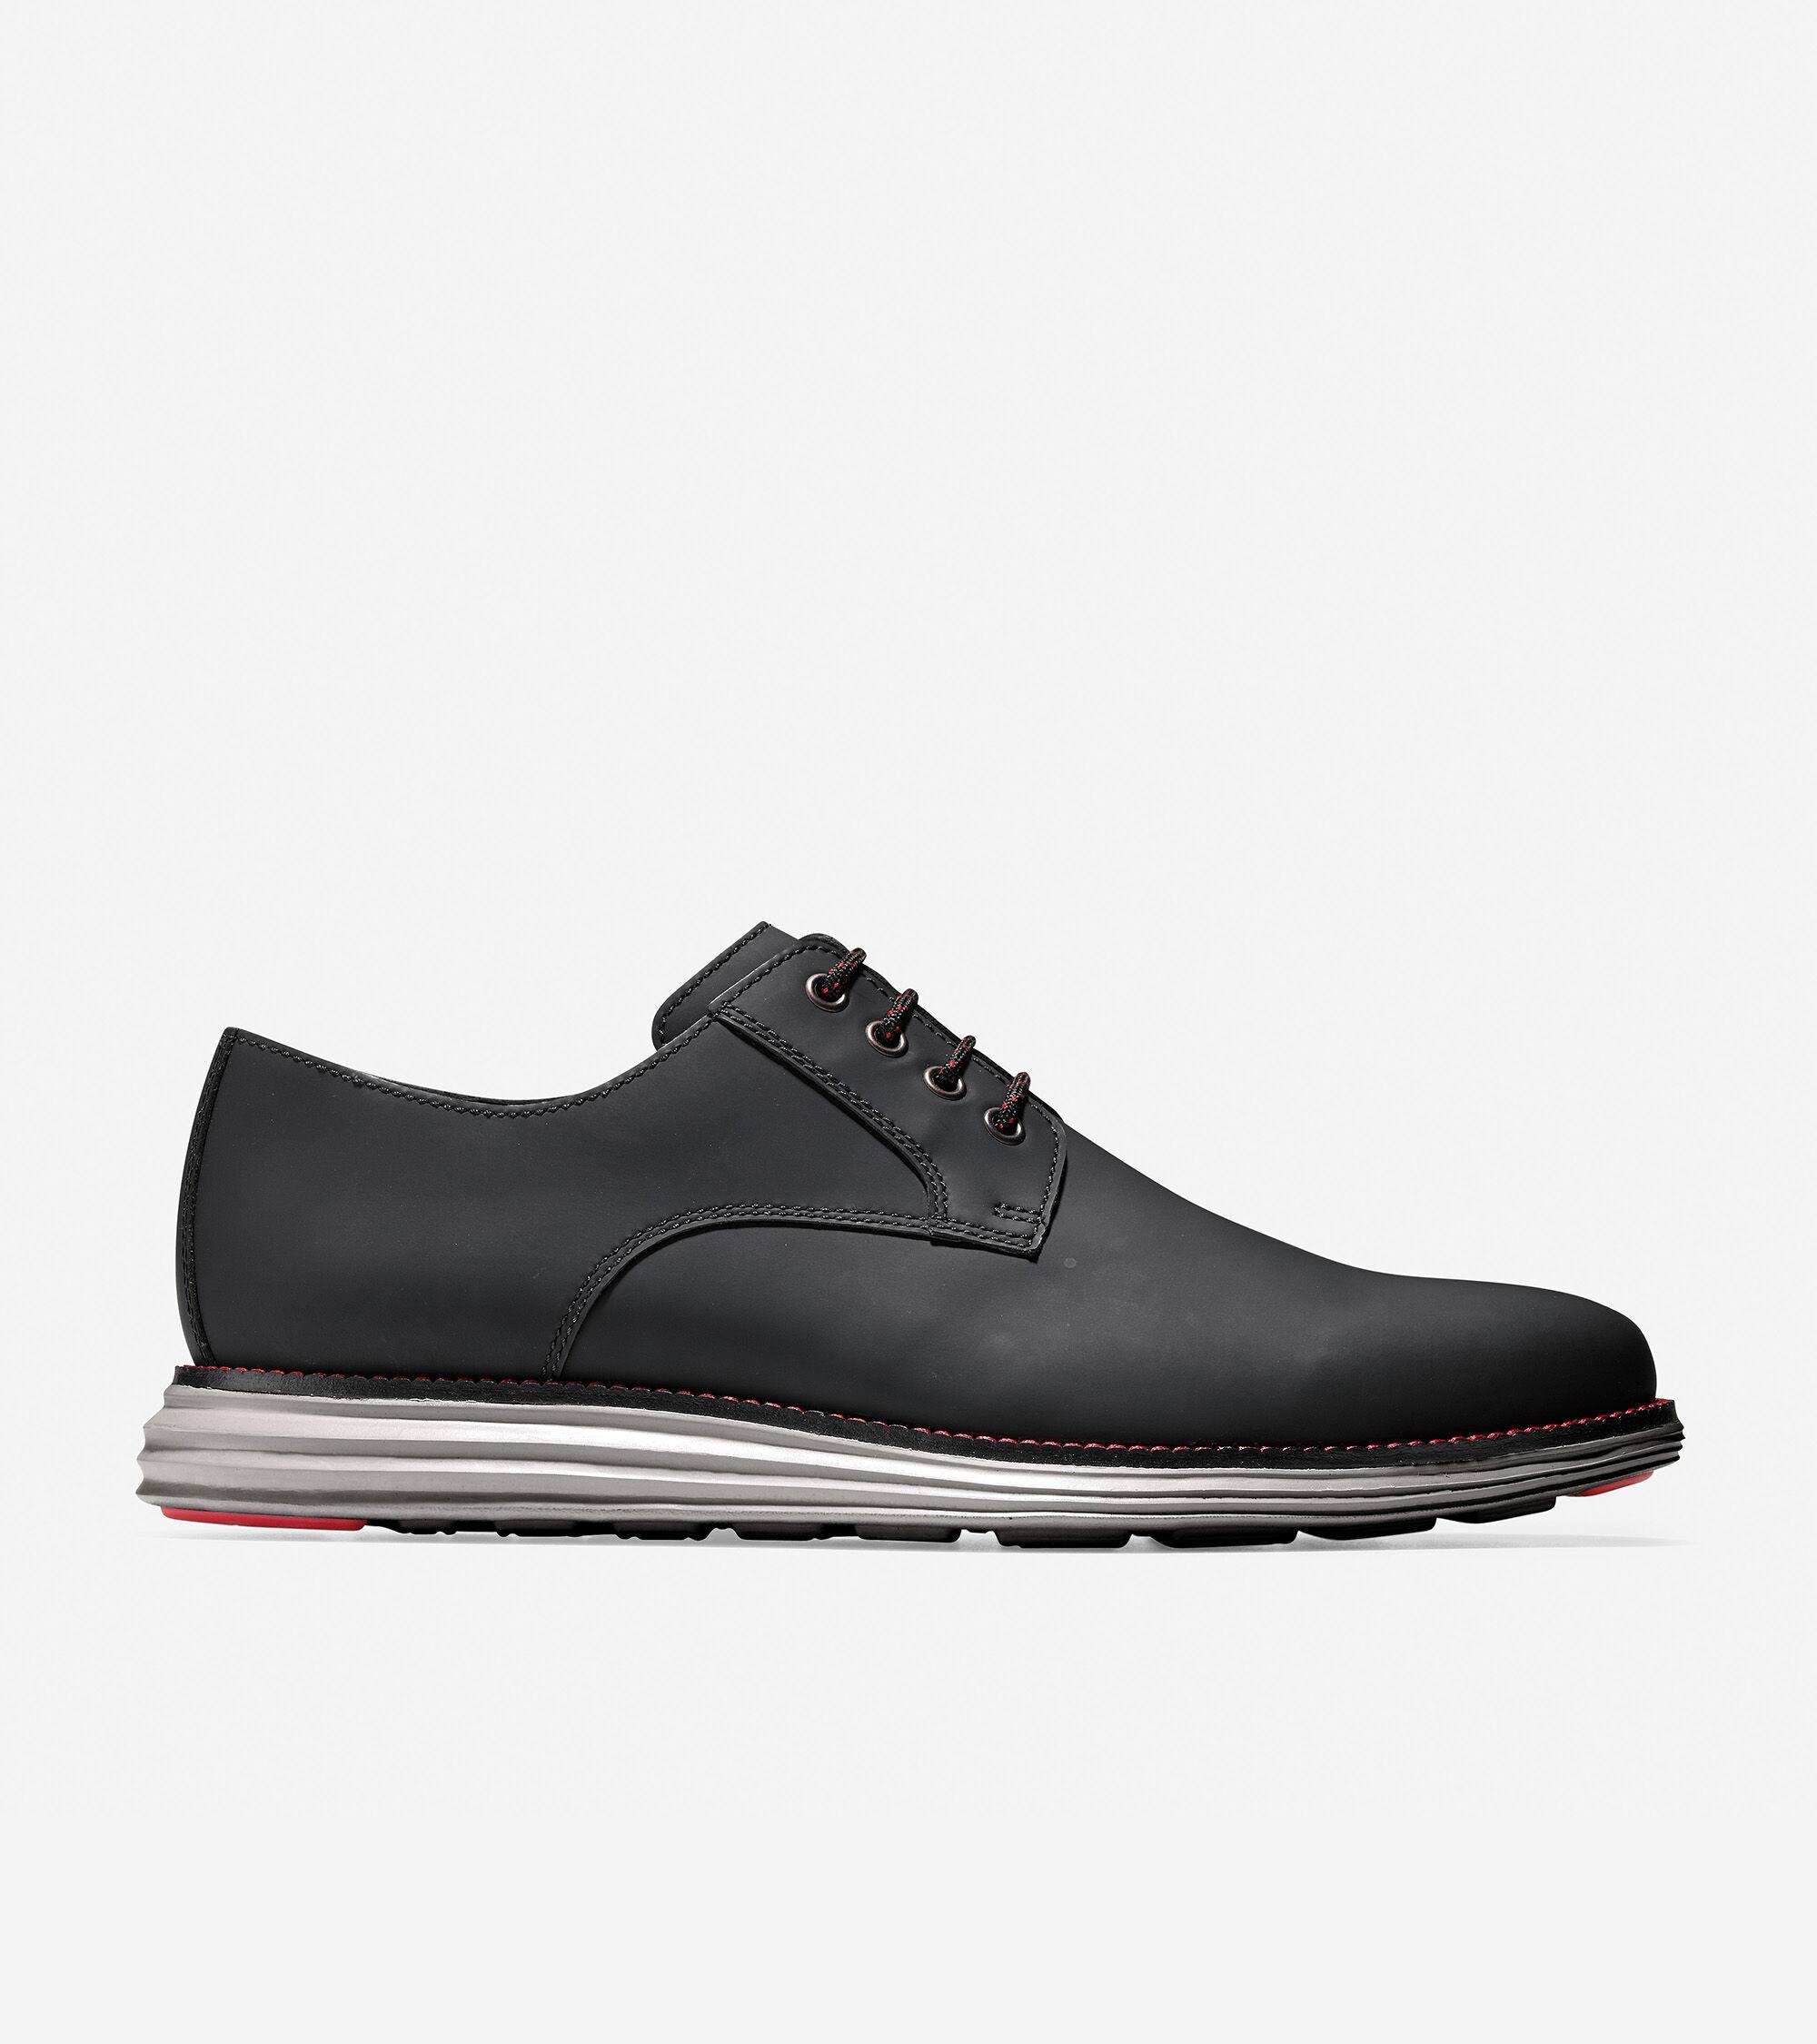 Plain Toe Oxford in Black Matte Leather